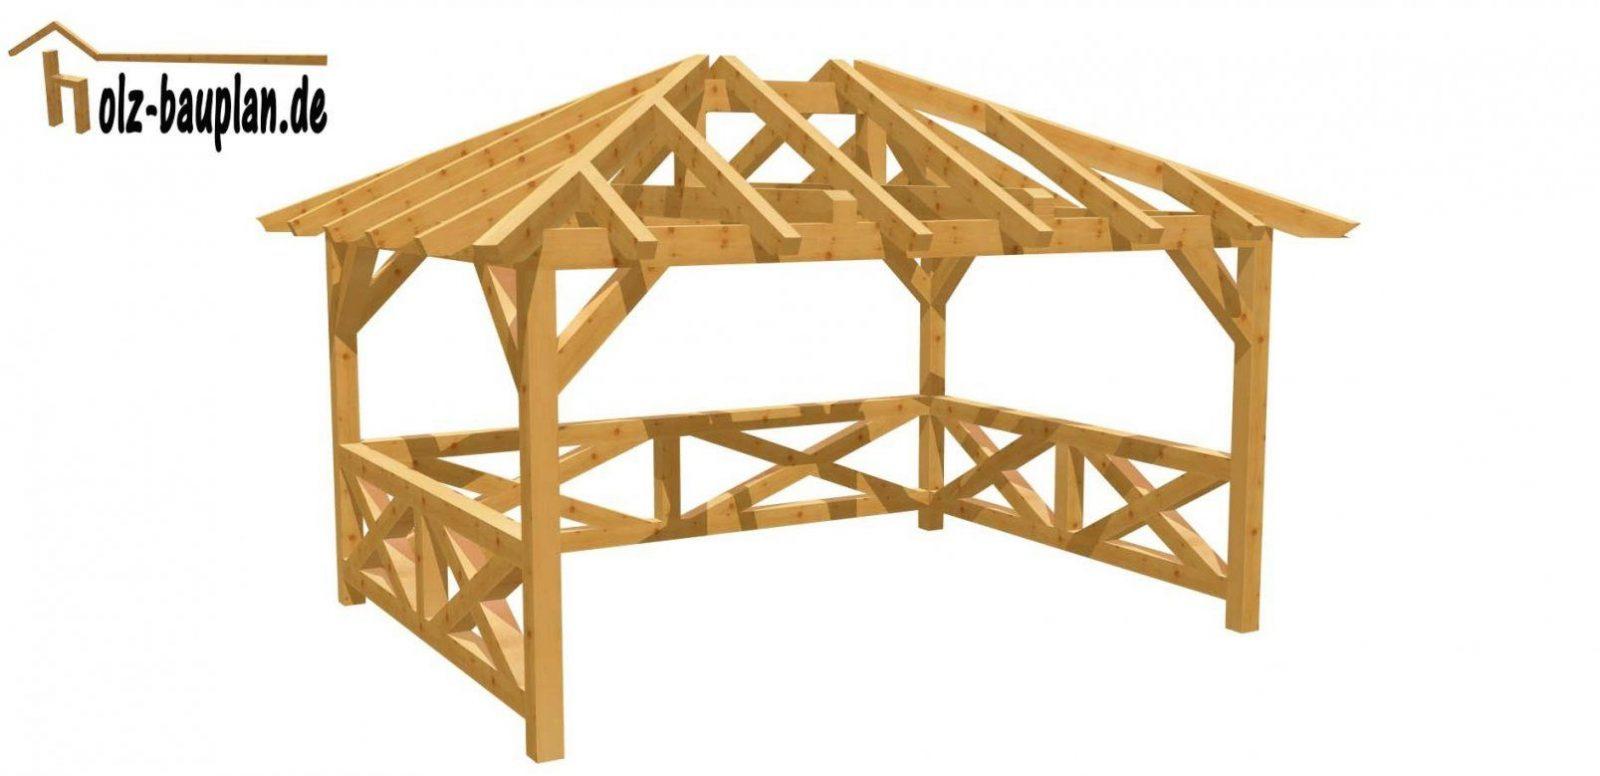 Pavillon Einfach Selber Bauen  Youtube von Pavillon Holz Selber Bauen Photo